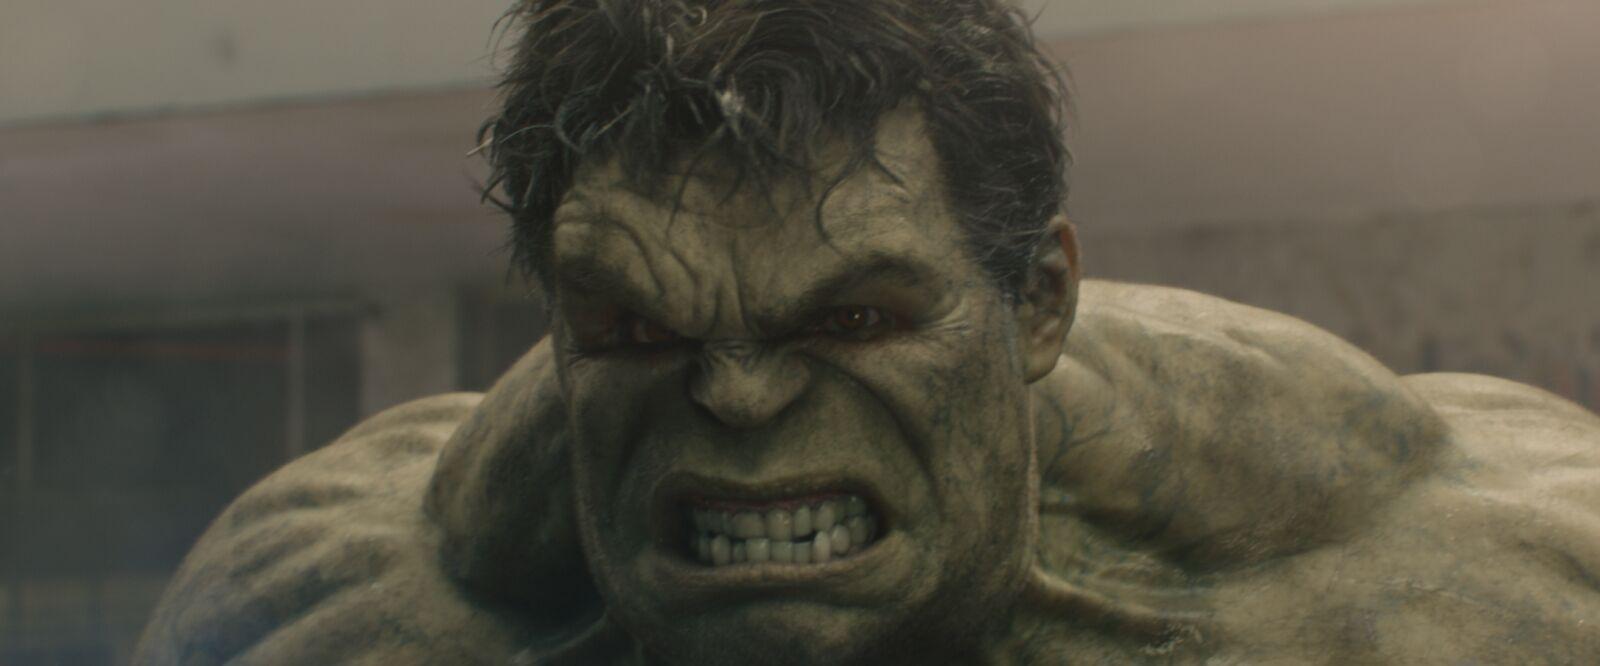 Edward Norton reveals Marvel scrapped his plans for a dark 'Hulk' movie